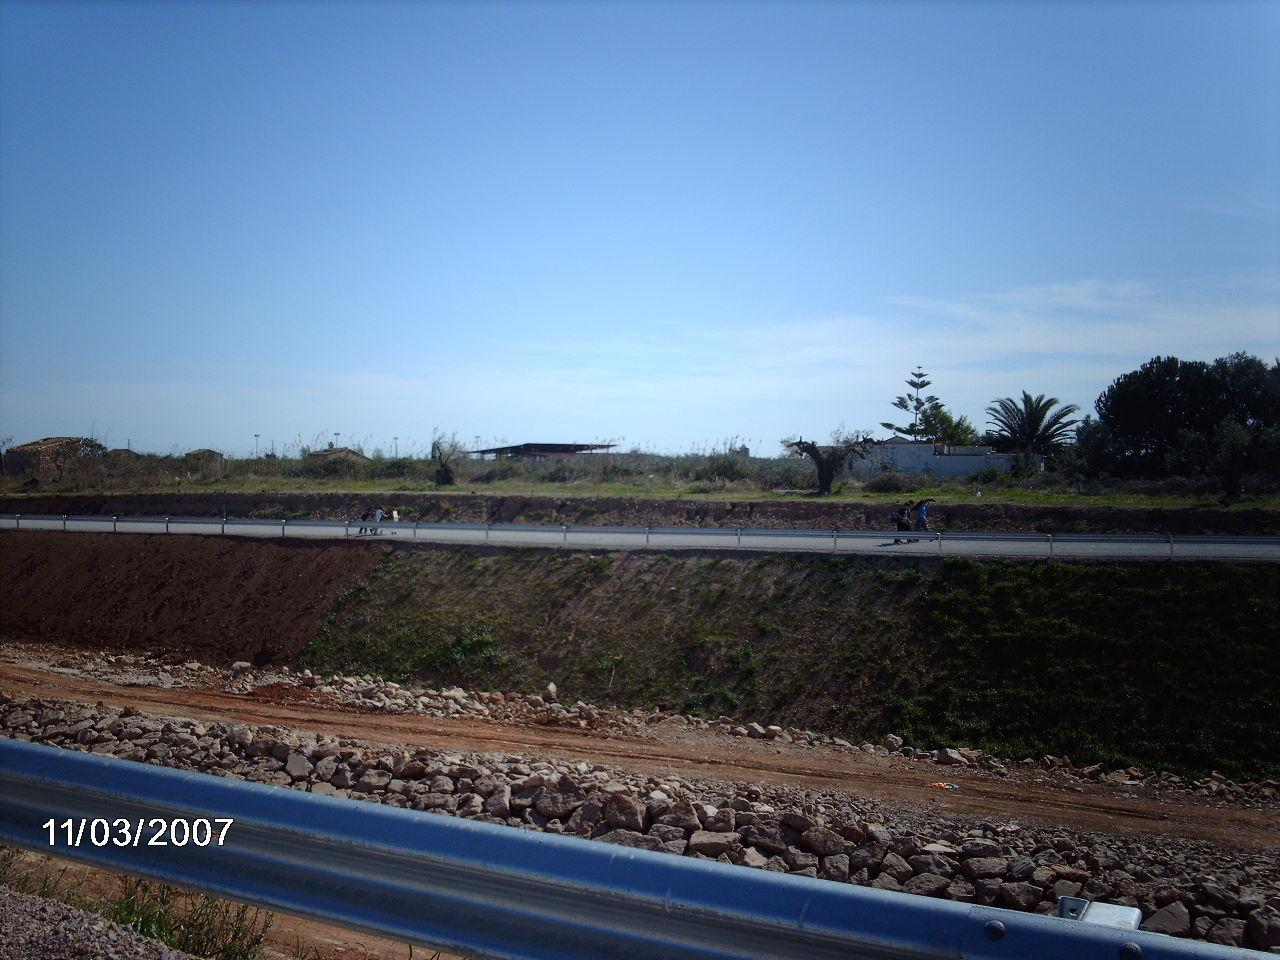 IMAG1591